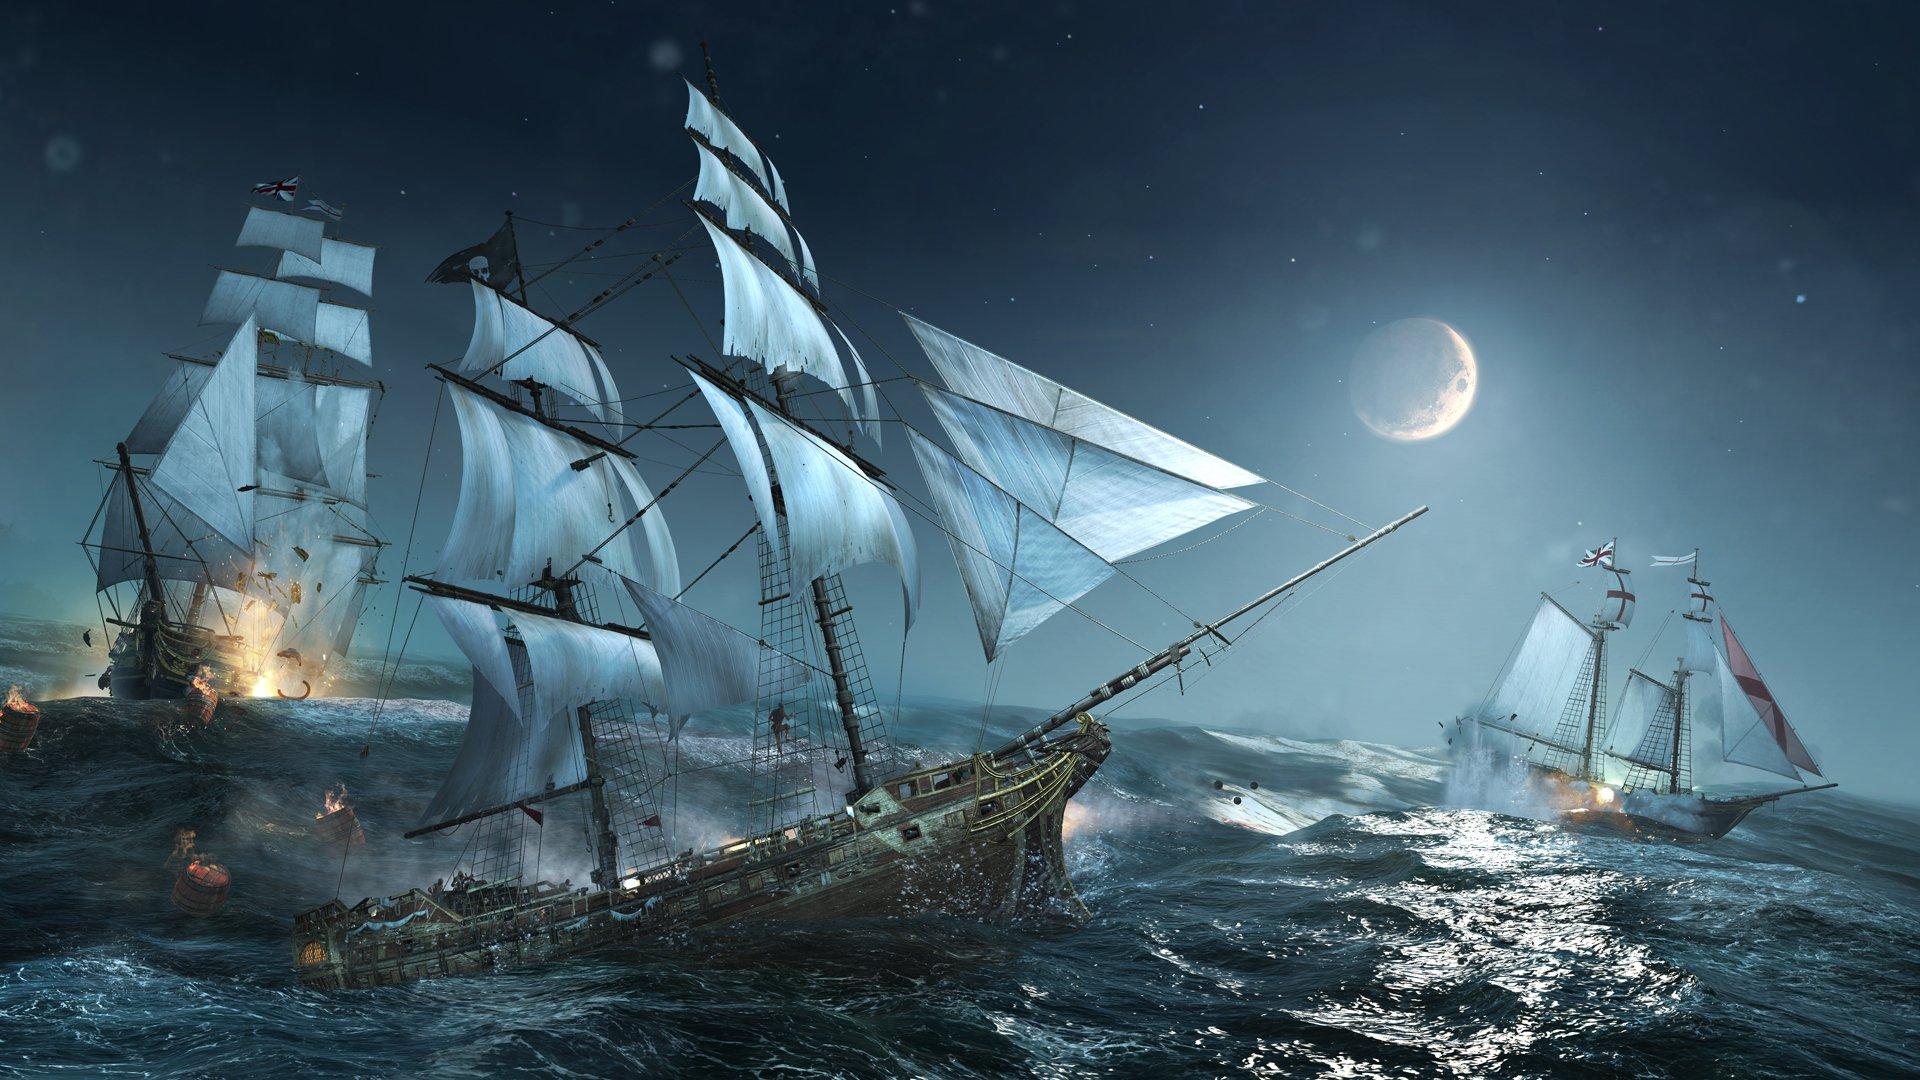 Sailing Ships HD Wallpaper 1920x1080 ID51976 1920x1080